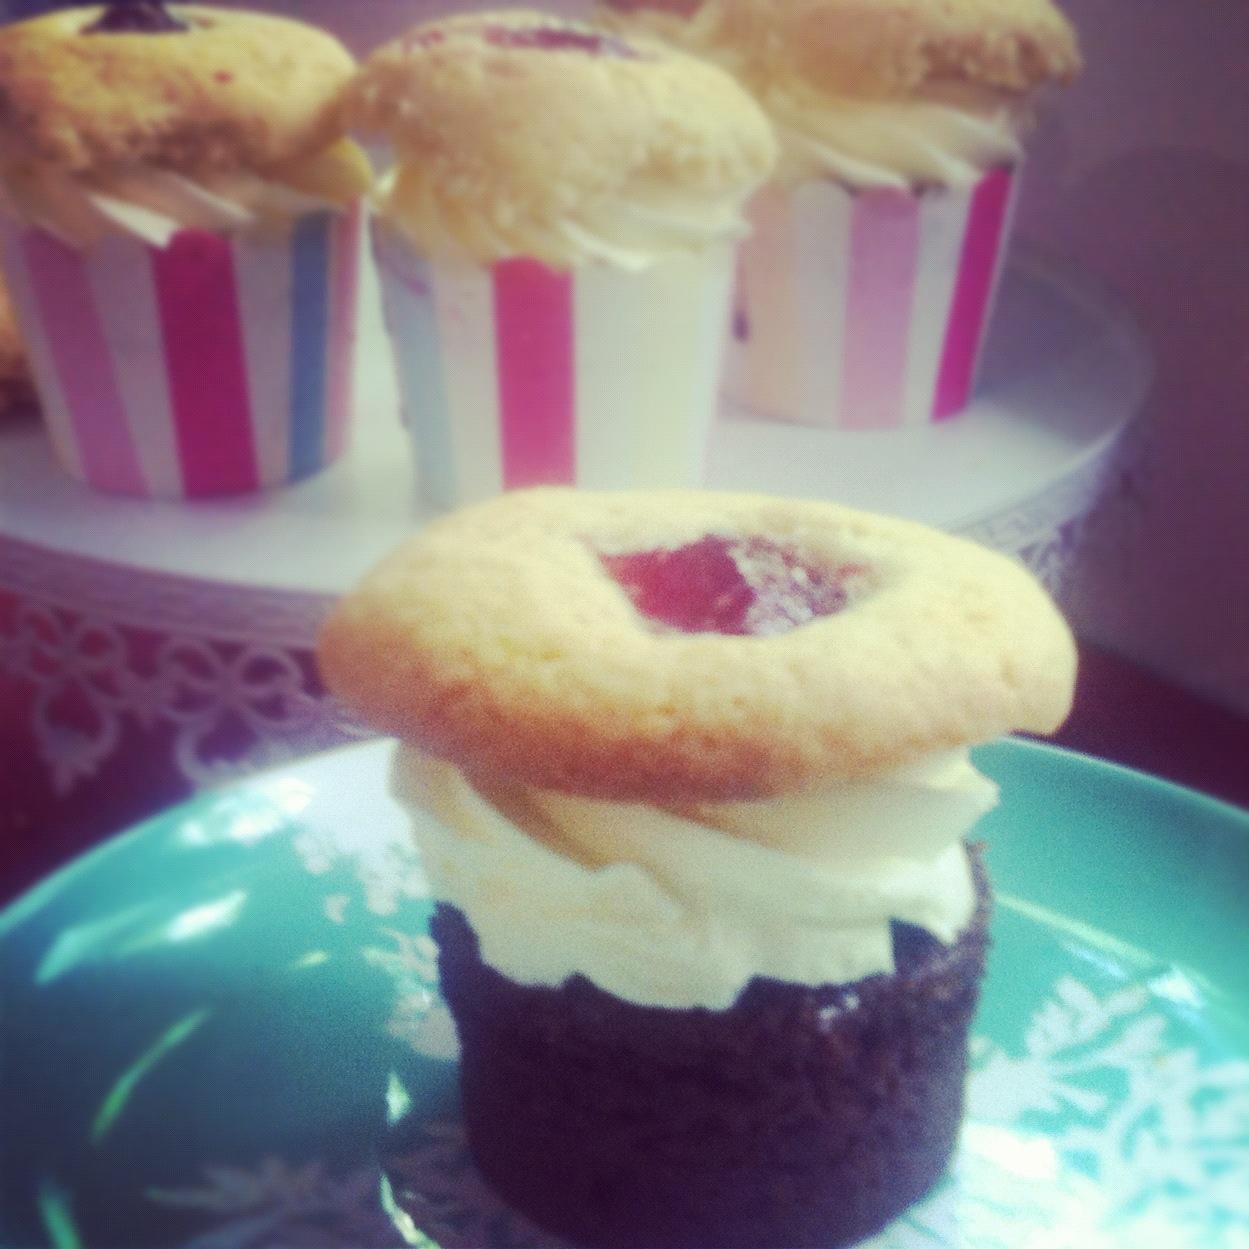 http://weekend-mummy.blogspot.com.au/2013/01/moving-sucks-cupcakes-dont.html